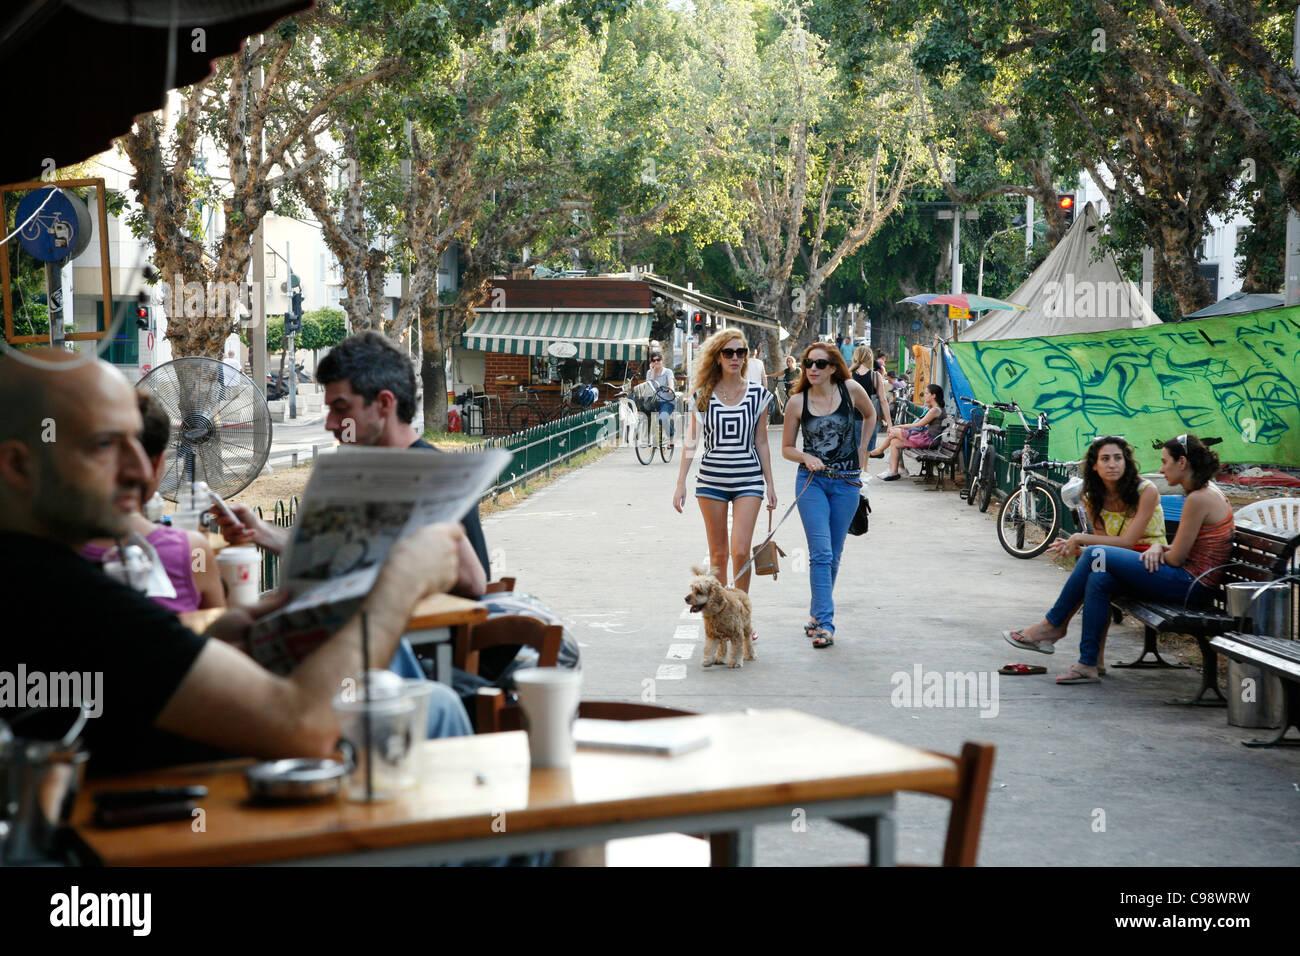 Scène de rue, le boulevard Rothschild à Tel Aviv, Israël. Photo Stock